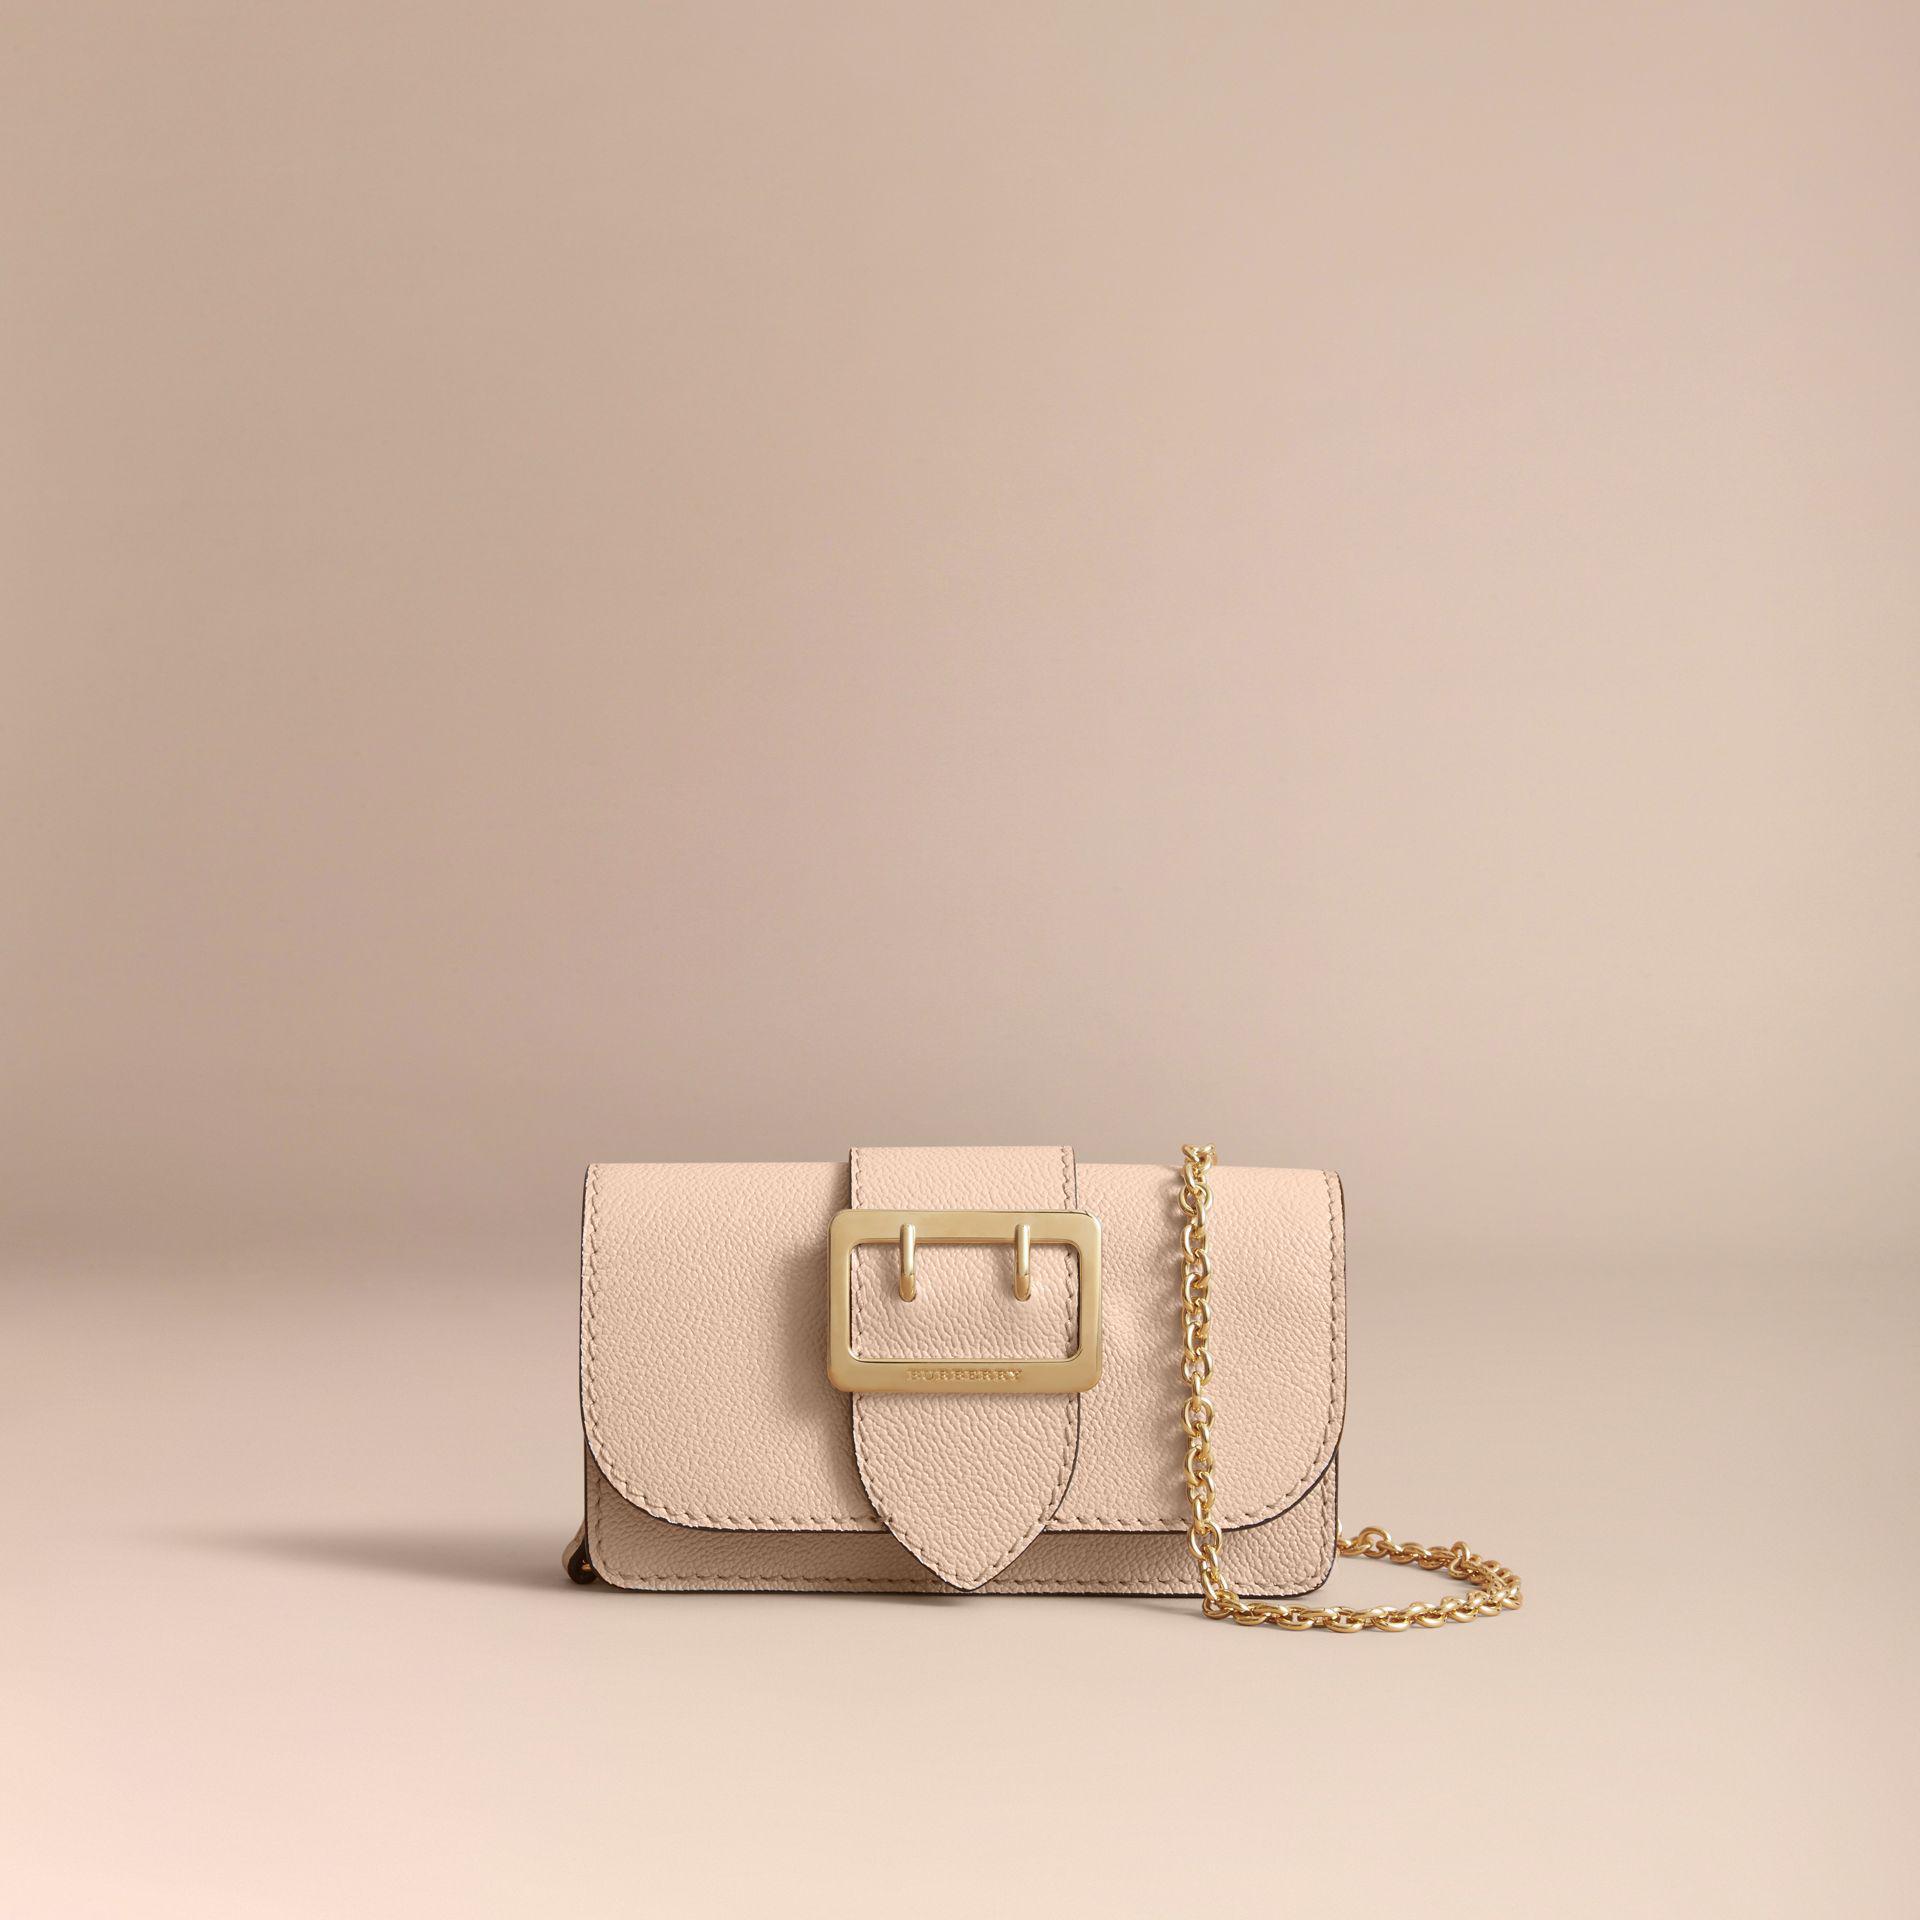 1e85db1dd219 Lyst - Burberry The Mini Buckle Bag In Grainy Leather Limestone